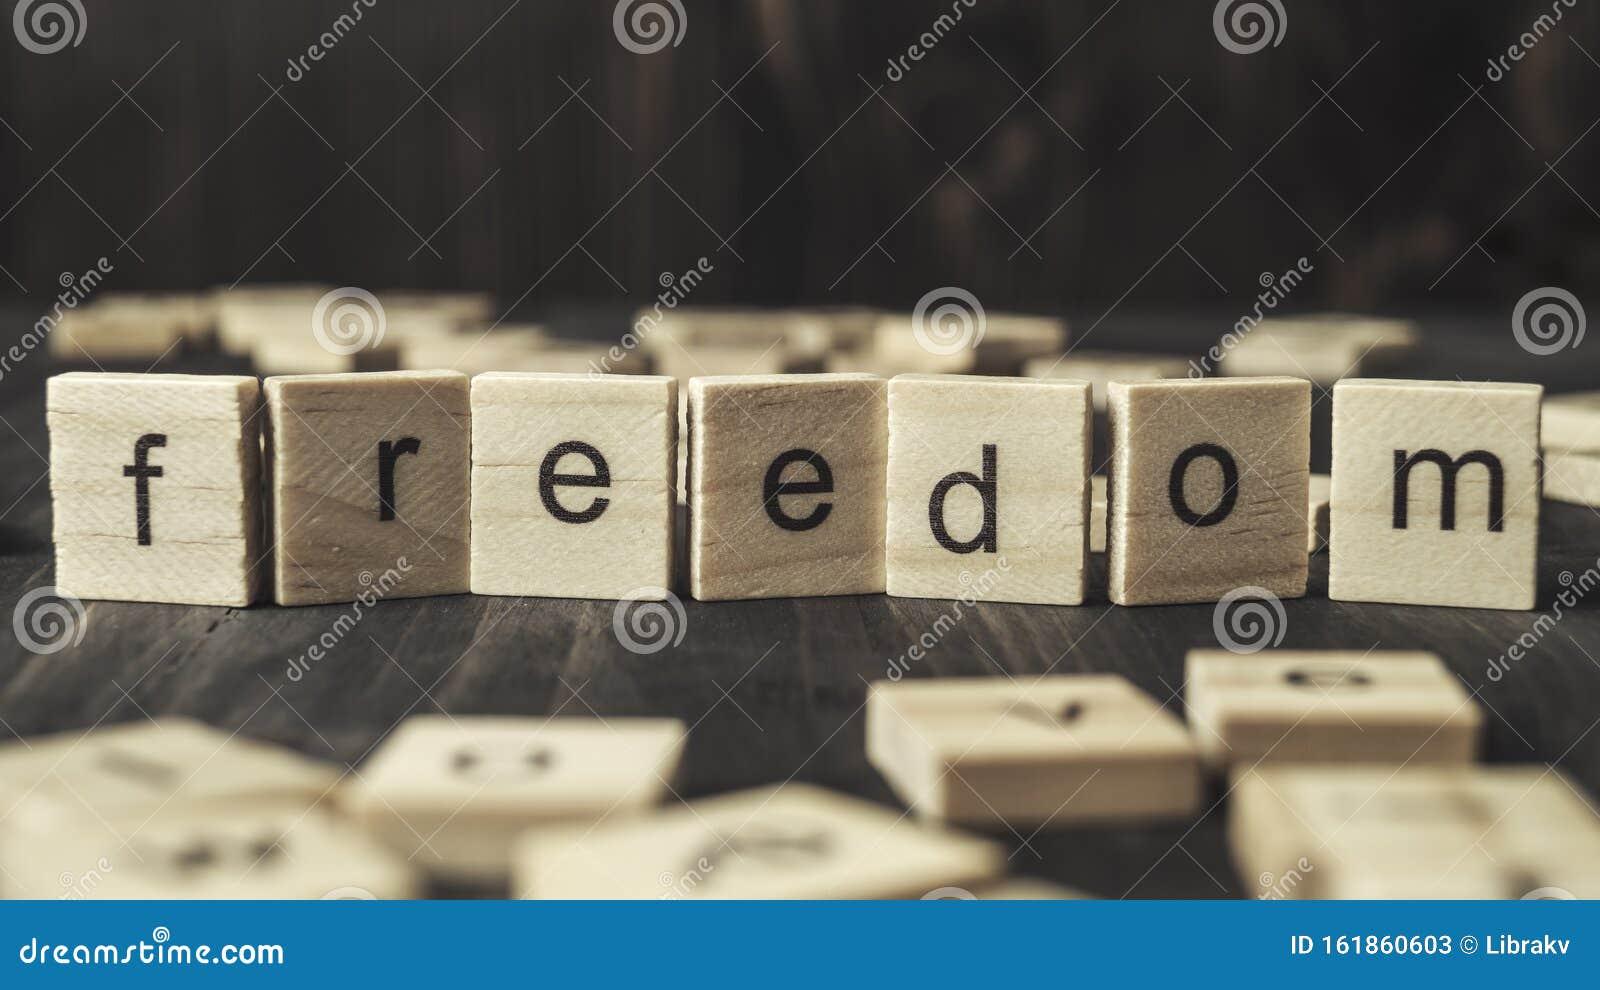 Word freedom written on wooden blocks